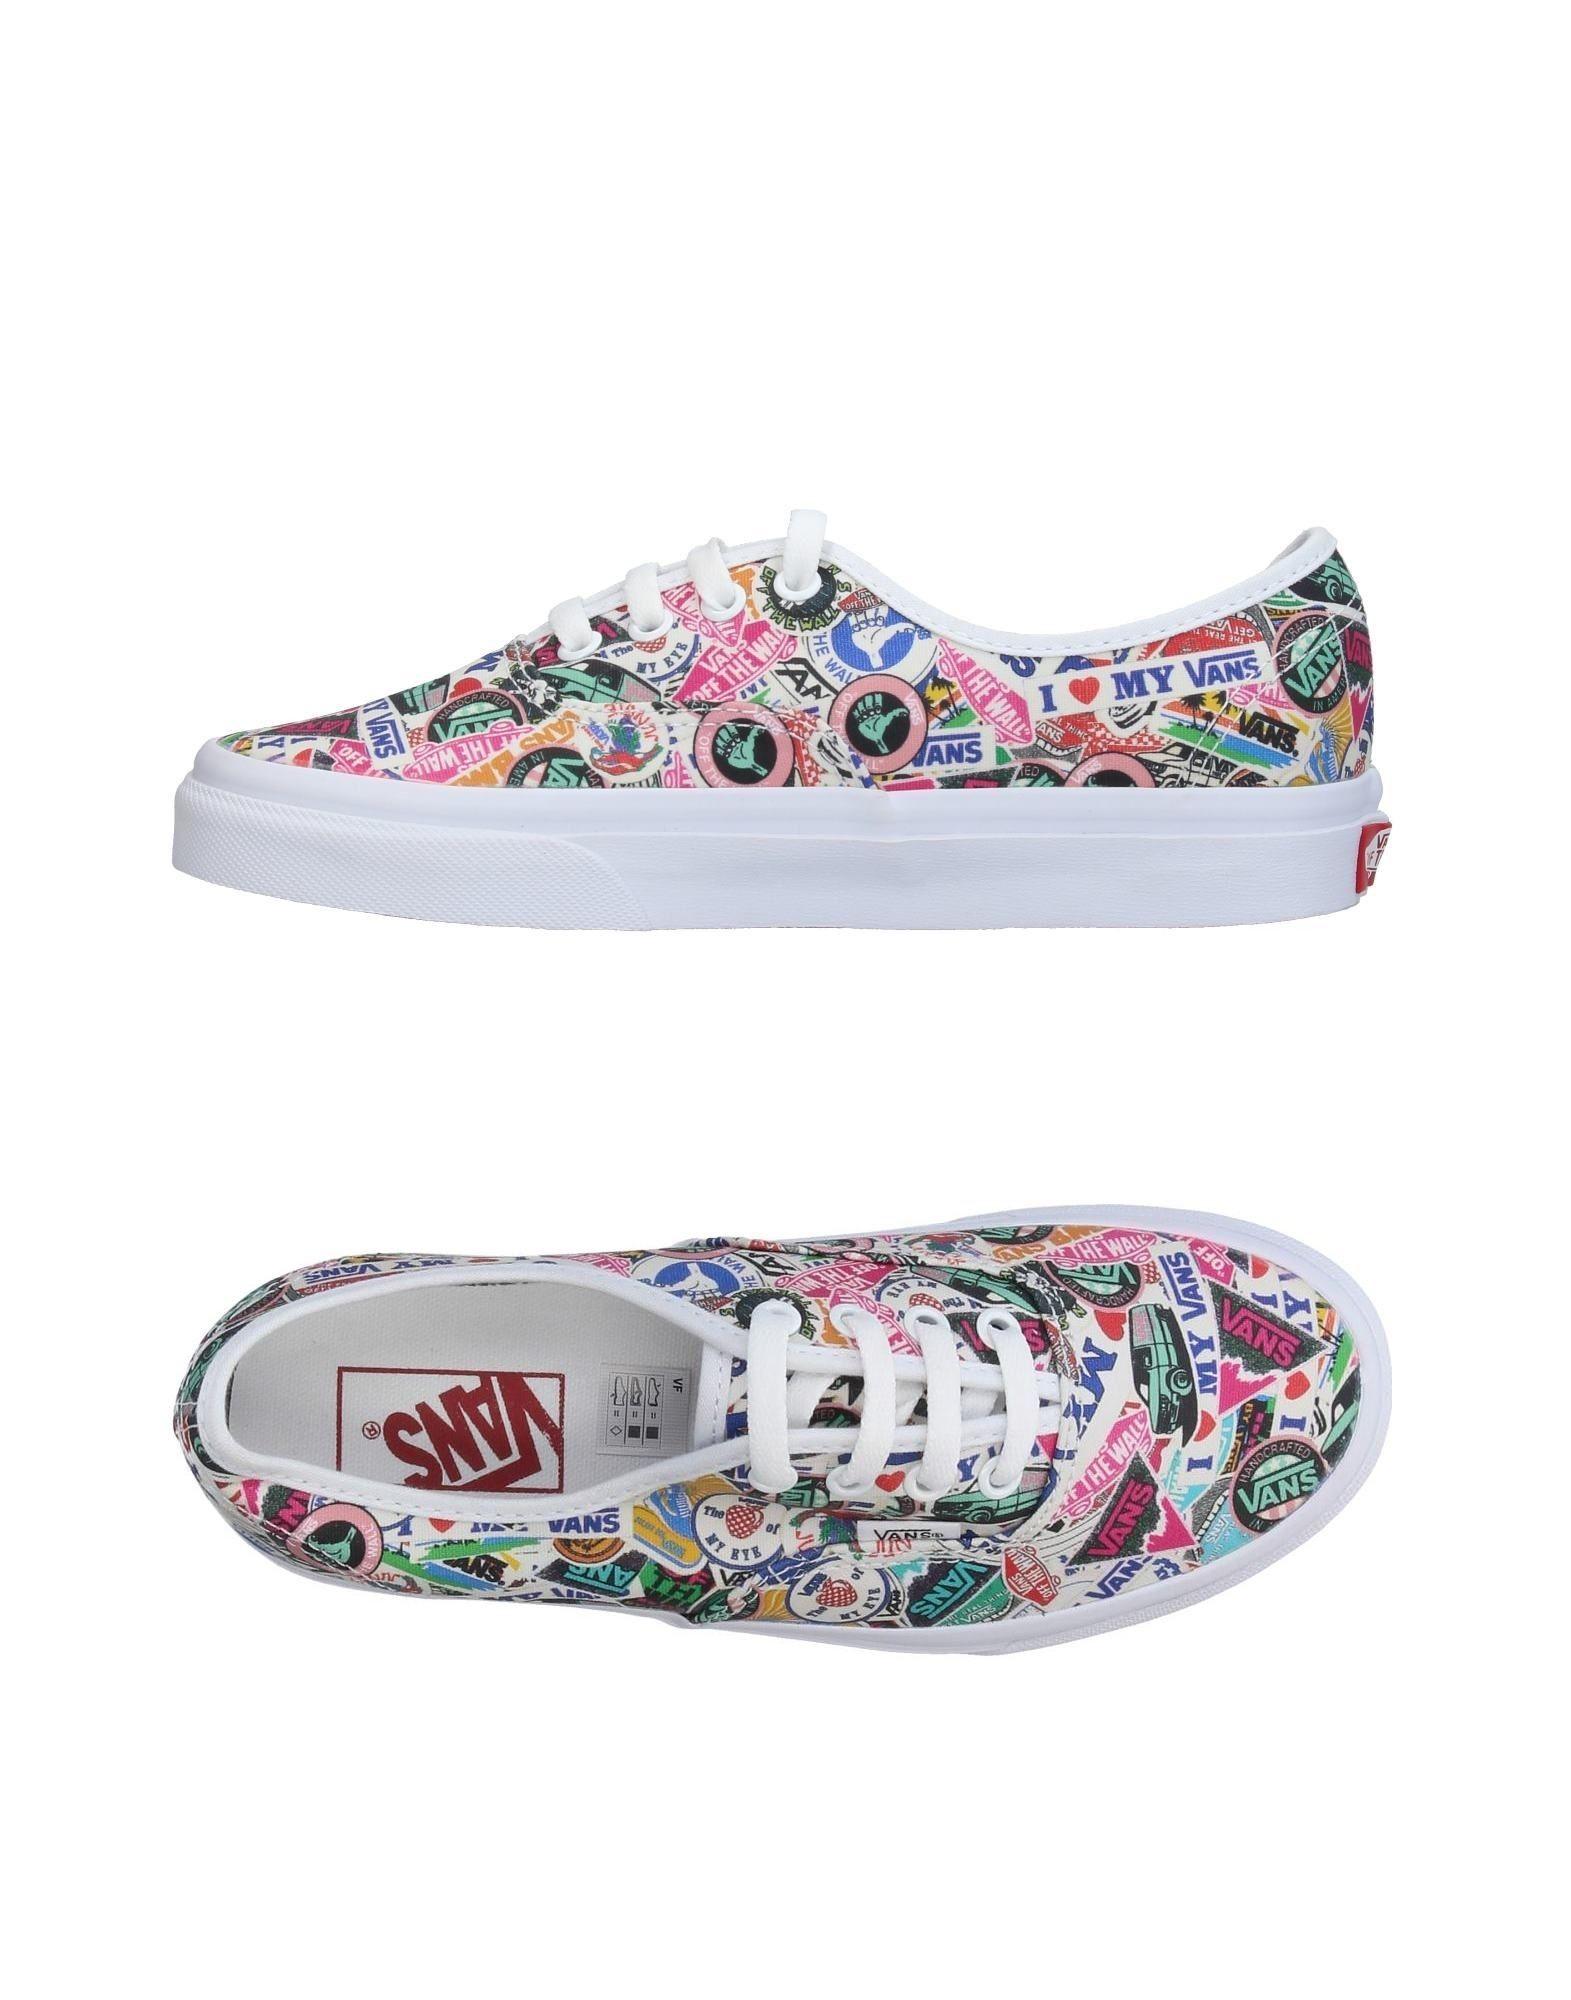 Vans Sneakers Damen  11384267FB Gute Qualität beliebte Schuhe